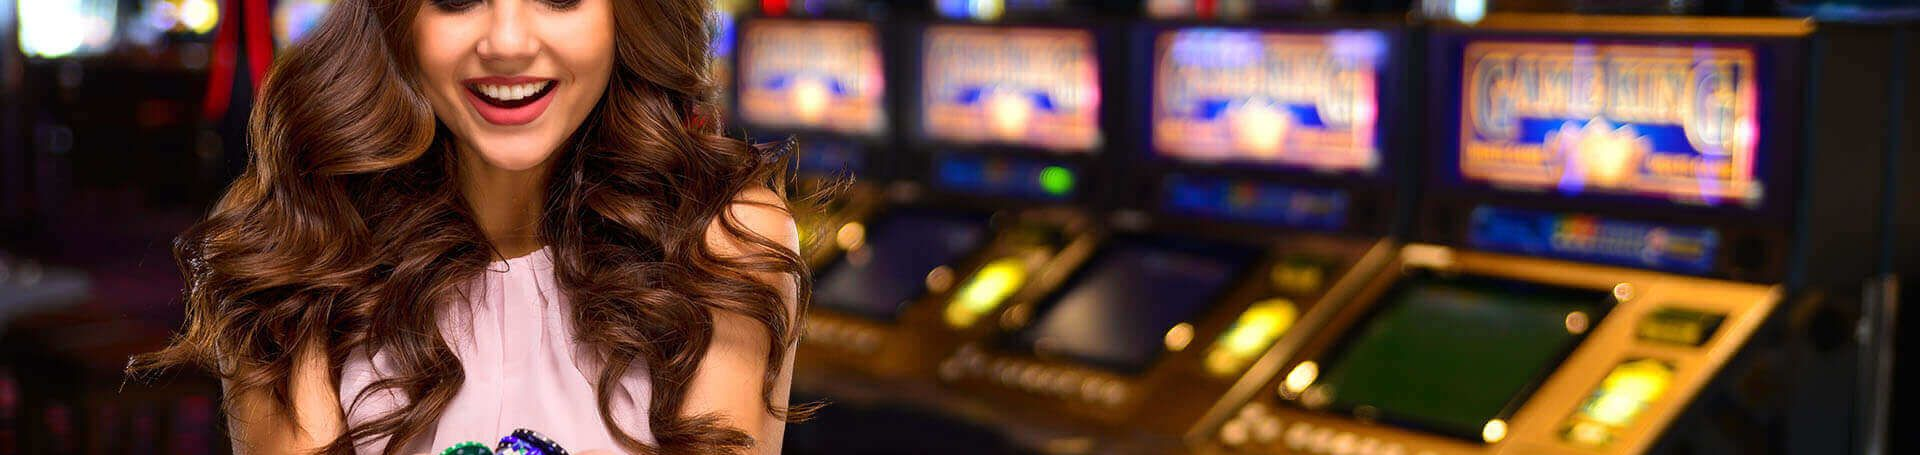 Live Blackjack – Play Online at Casino.com IN